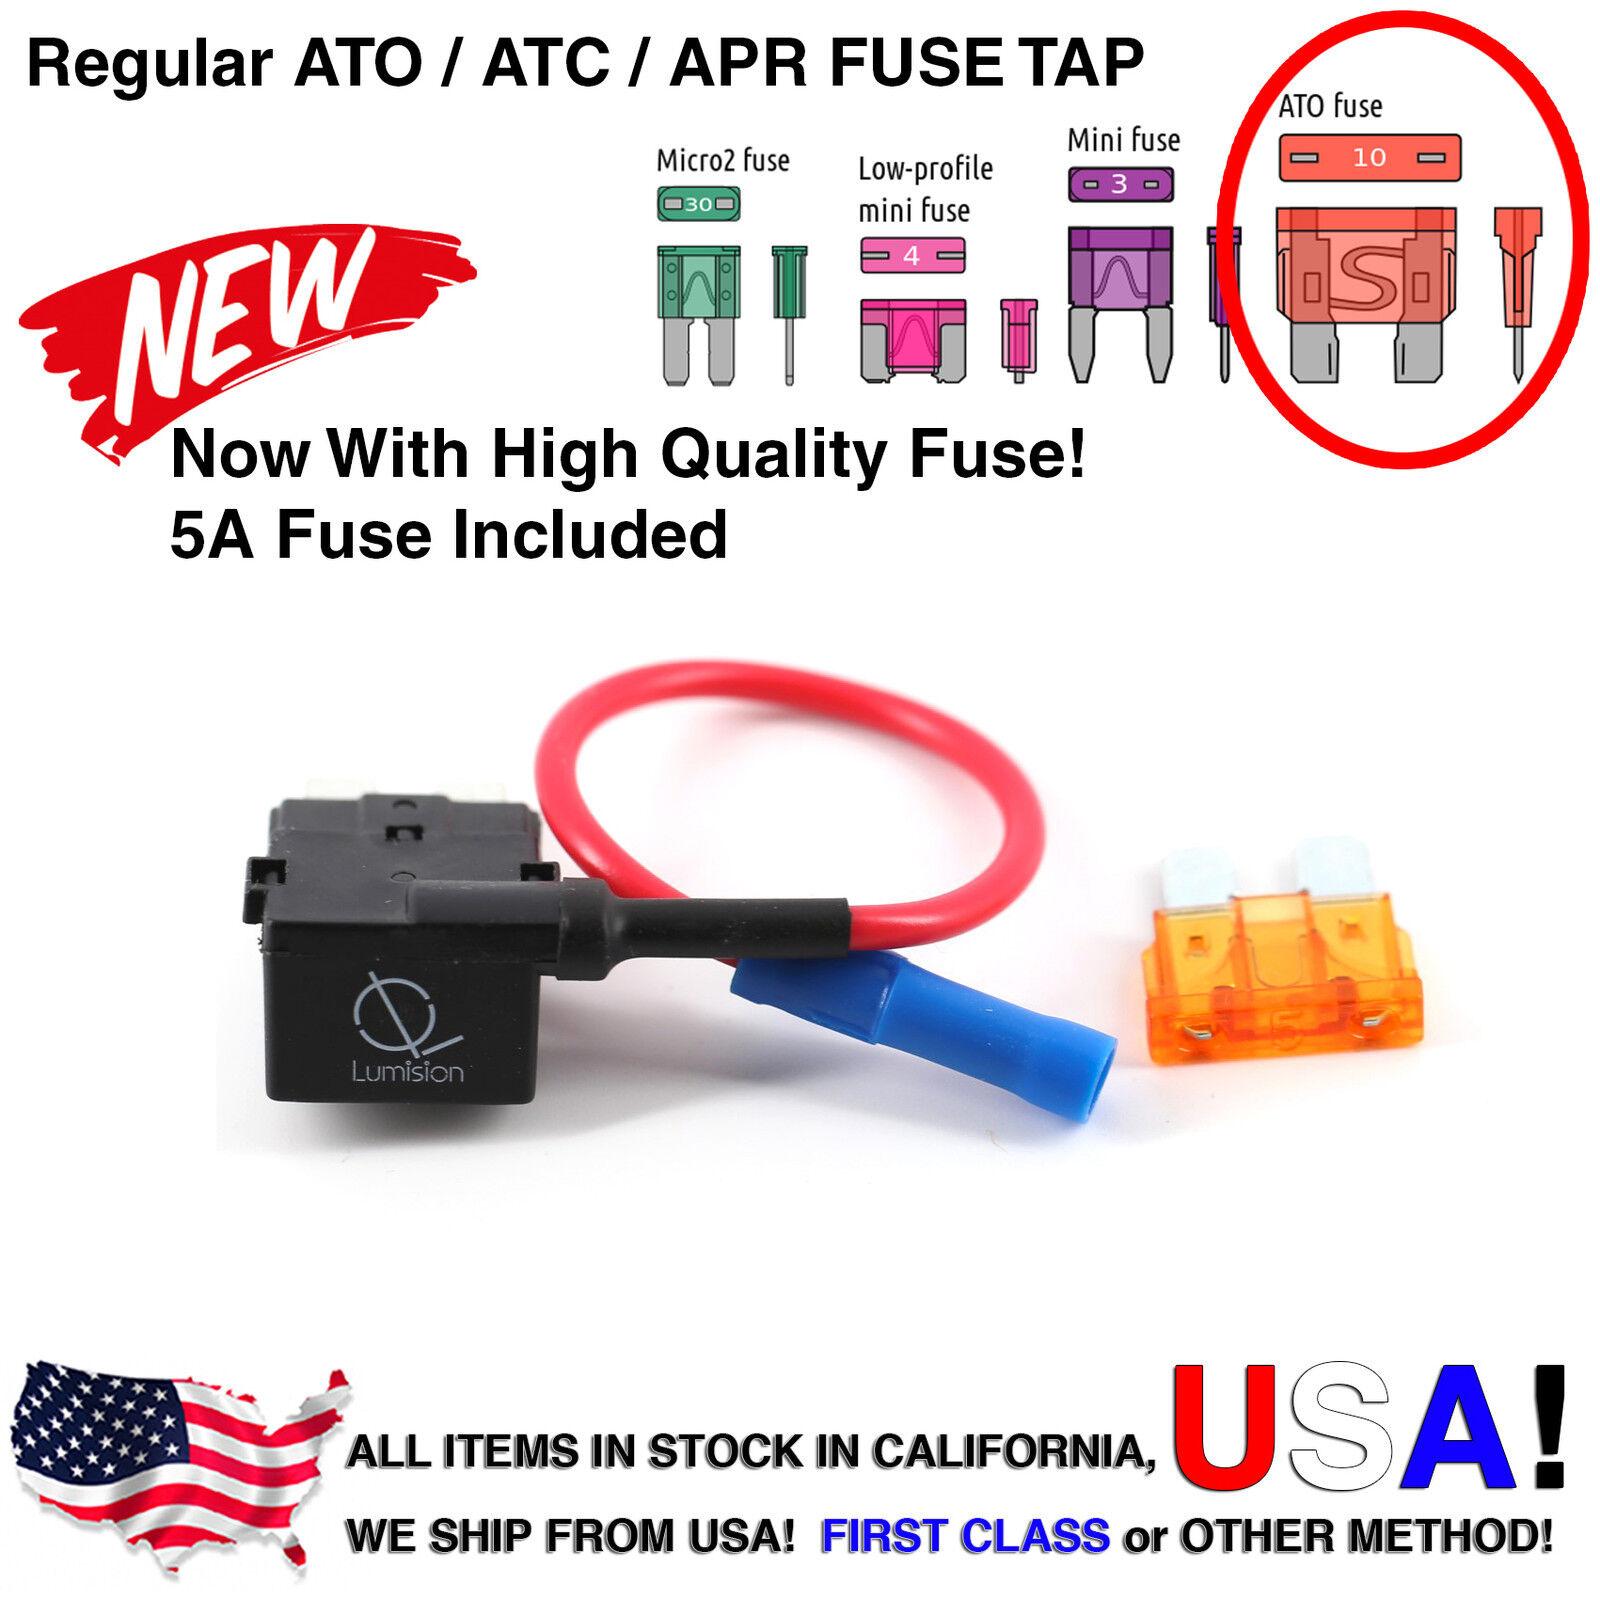 Fuse Tap Regular Ato Atc Apr W 5a Add A Circuit Dash Cam Radar Diy Atm Addafuse Addacircuit 4 Fuses For Mini Blade Style Norton Secured Powered By Verisign